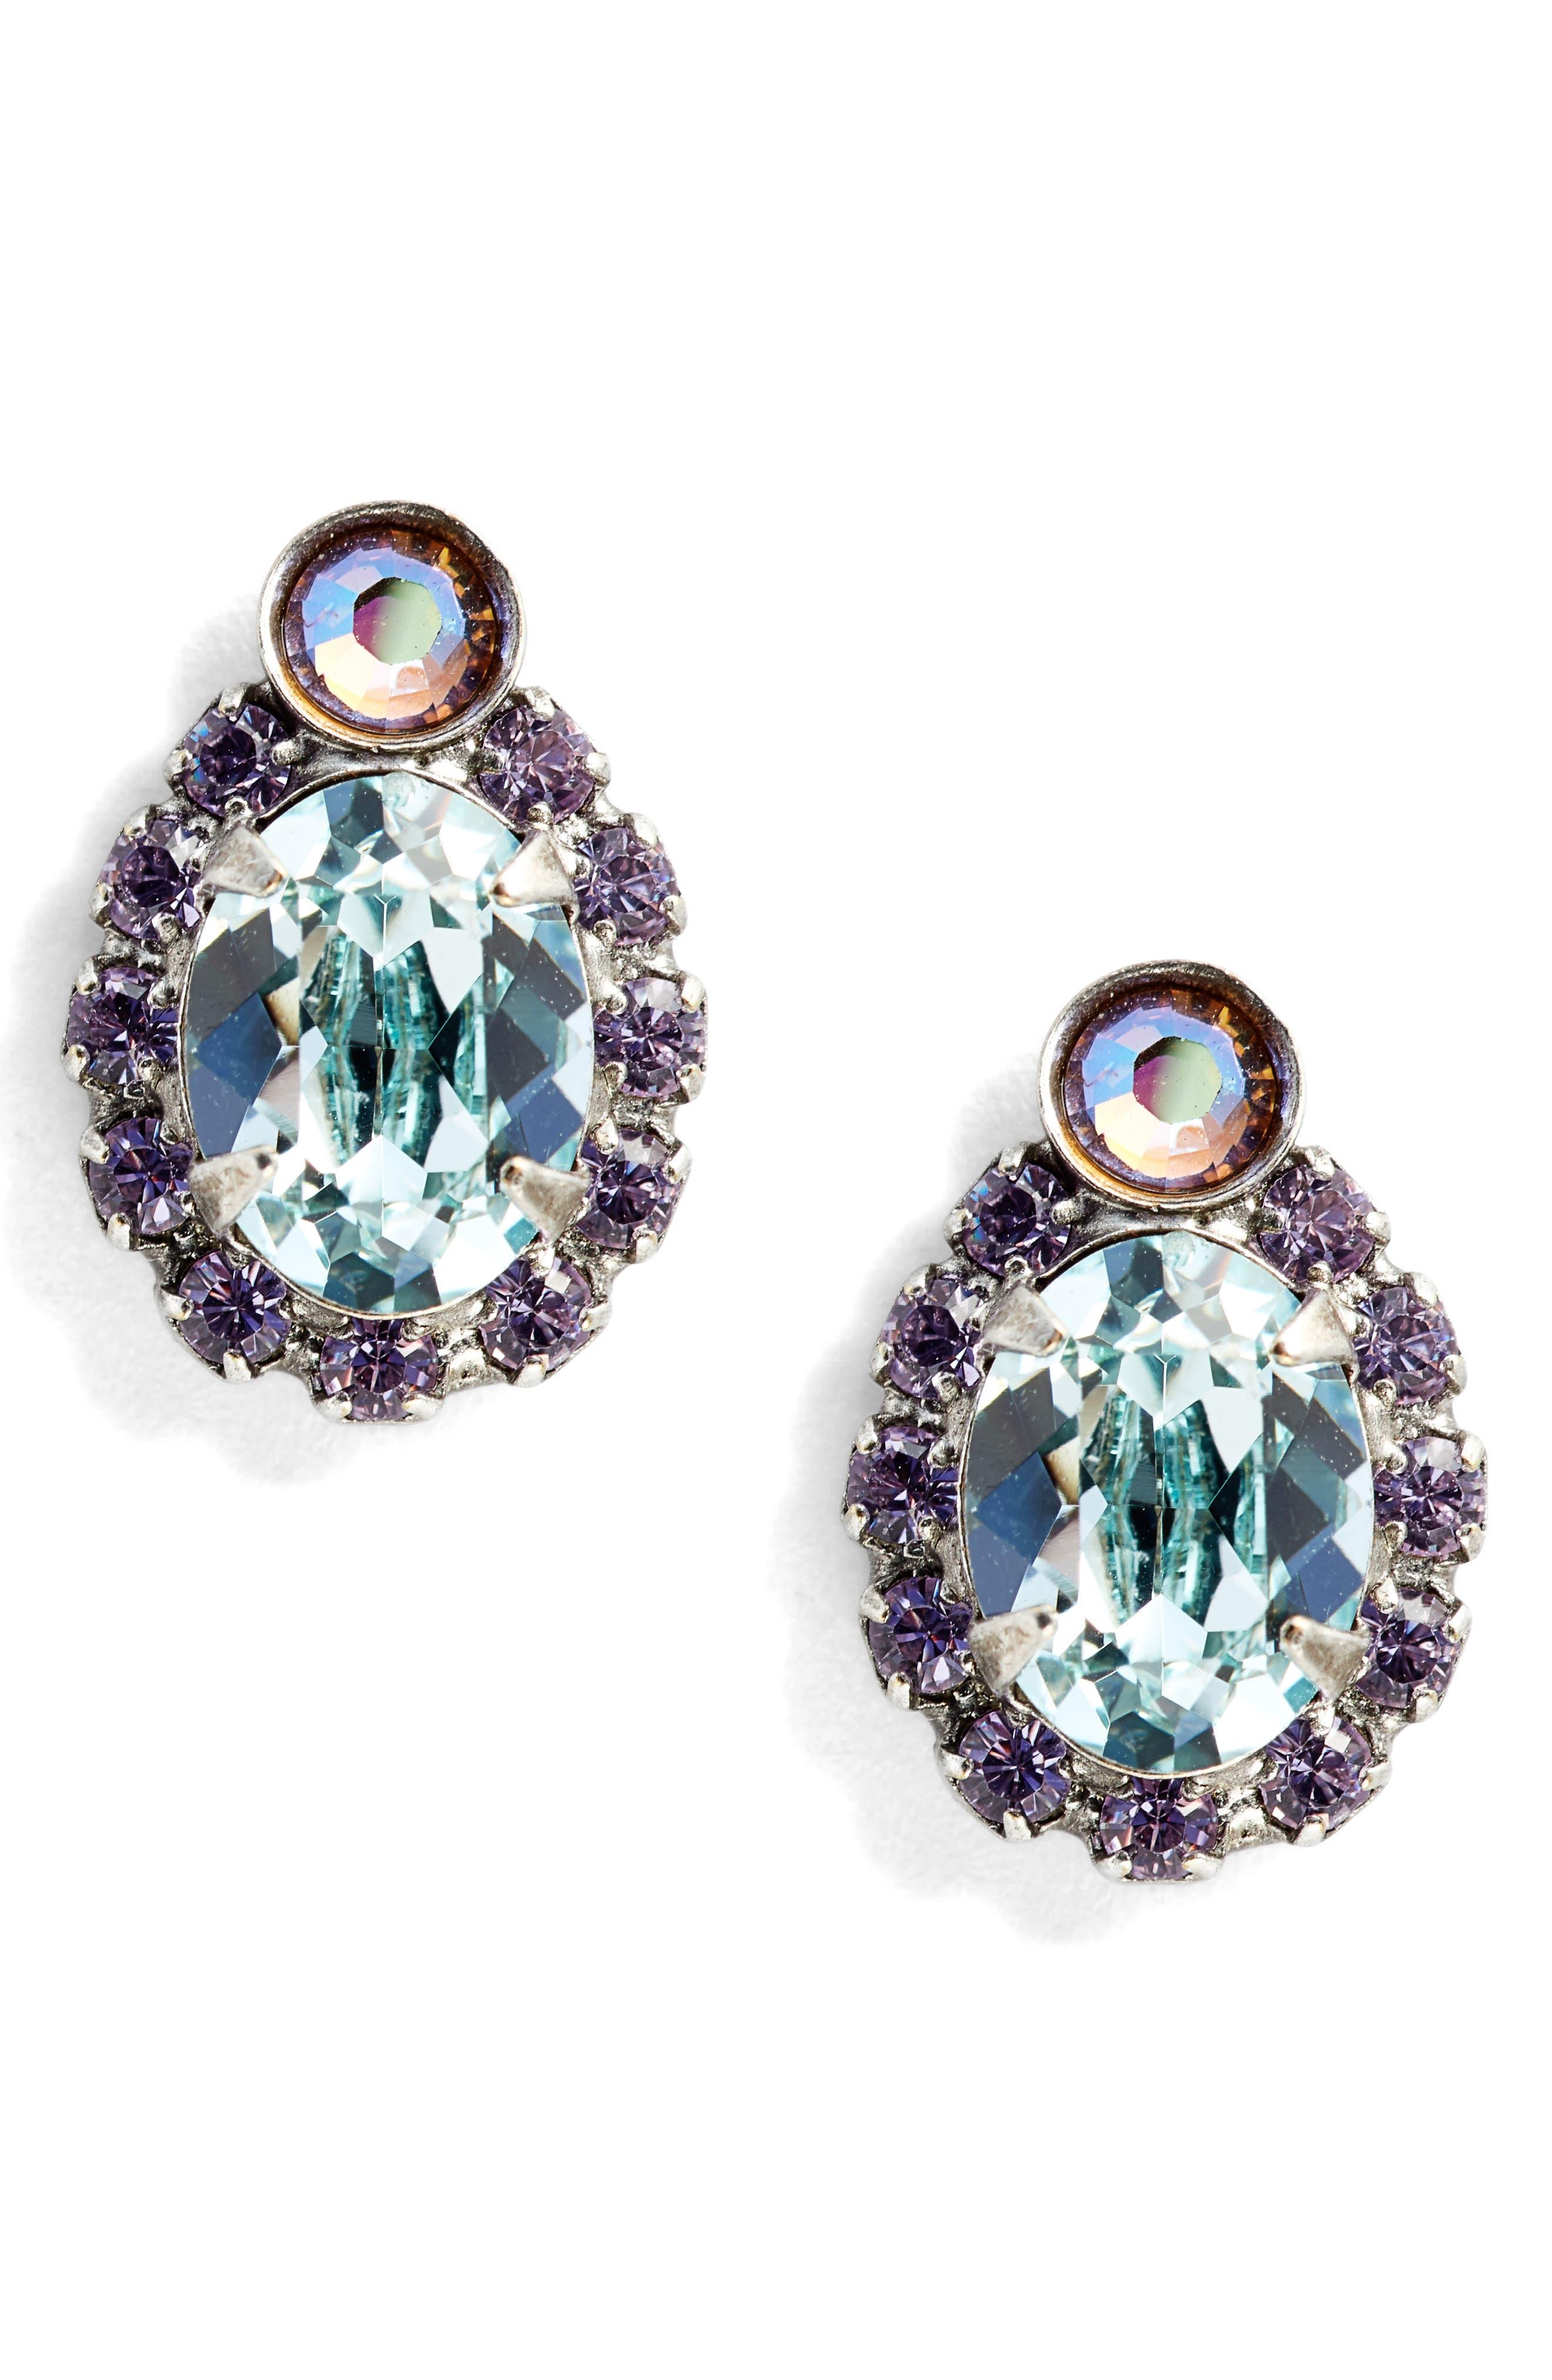 Pansy Crystal Earrings,                             Main thumbnail 1, color,                             Blue